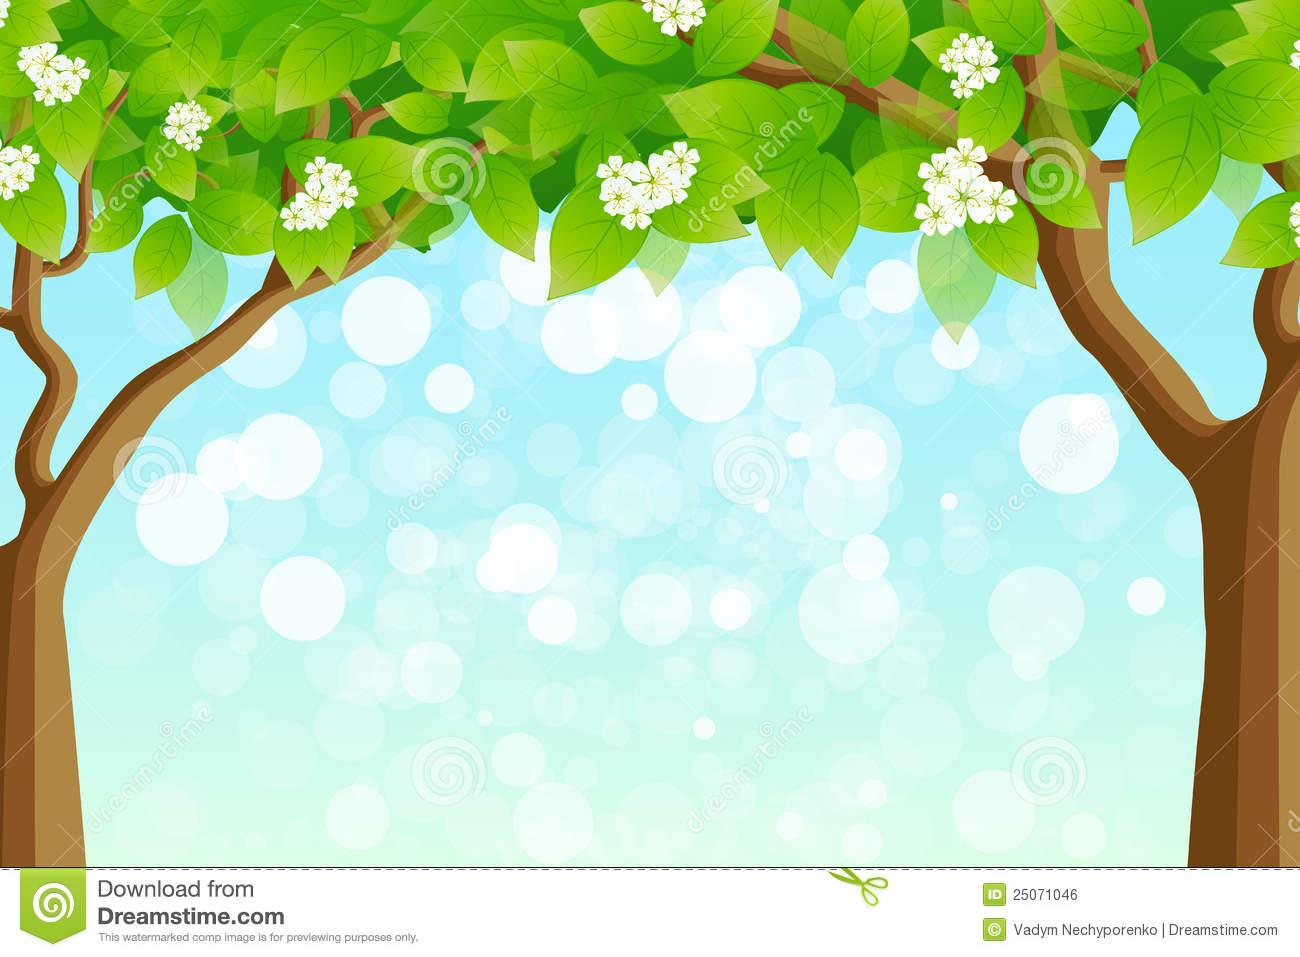 Tree clipart frame #14